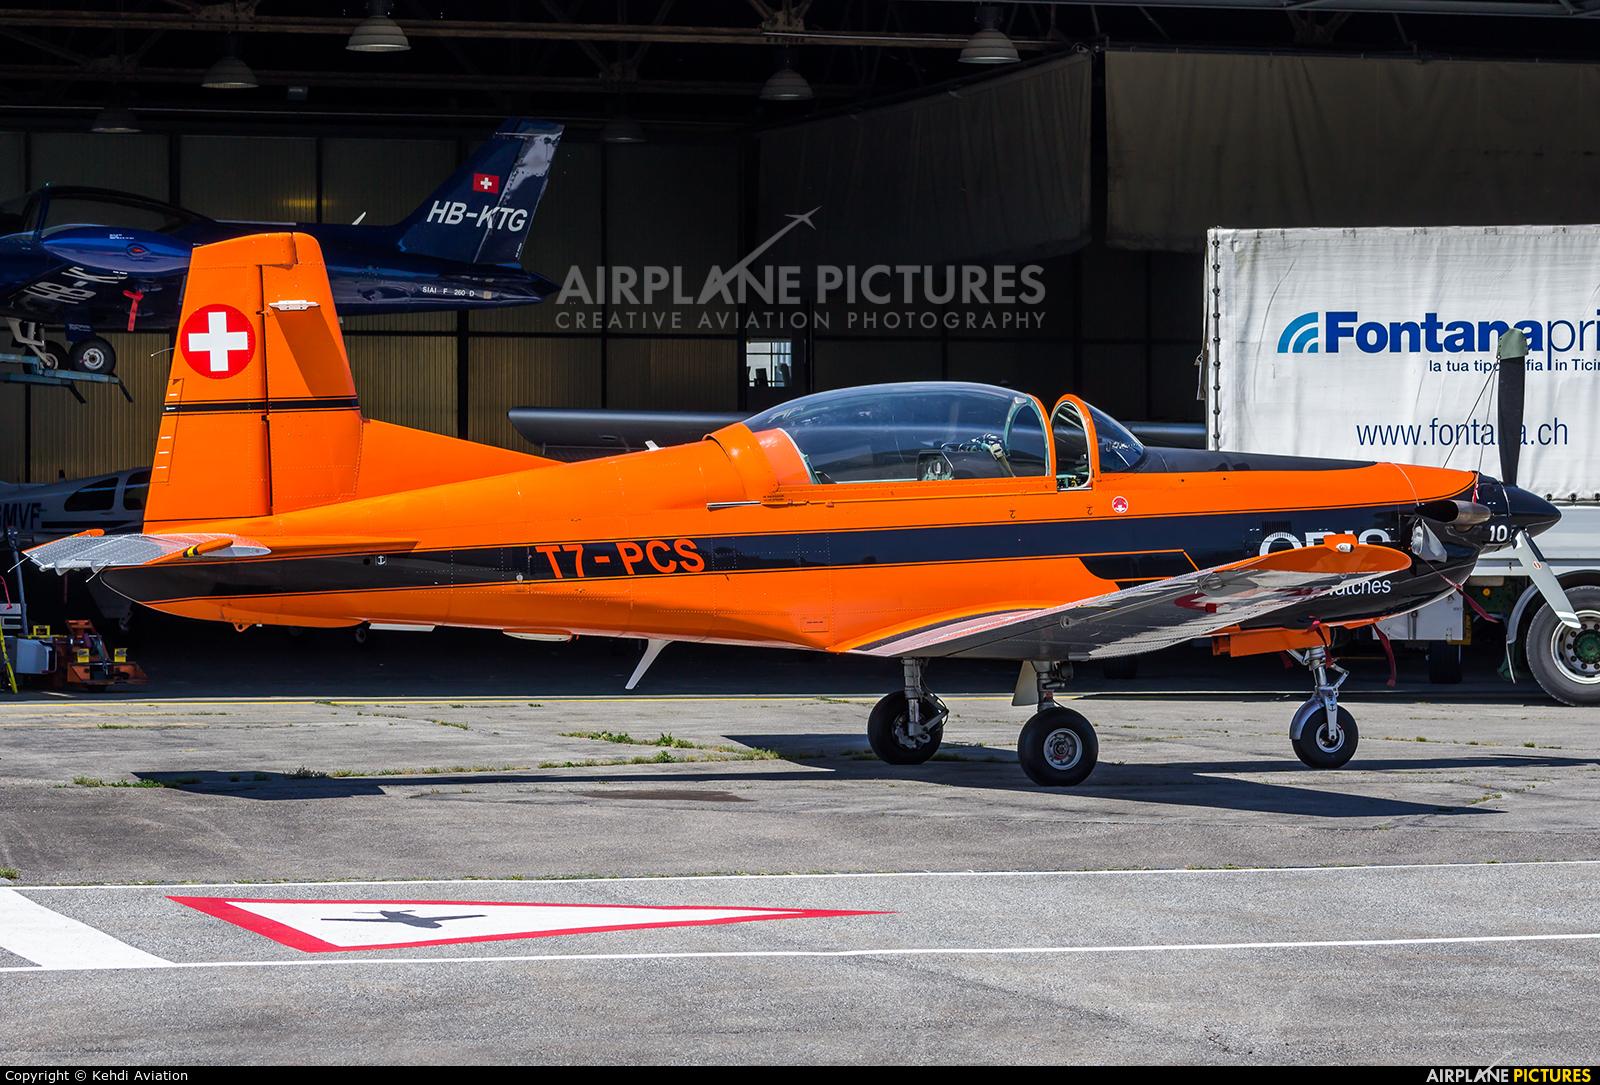 Private T7-PCS aircraft at Locarno